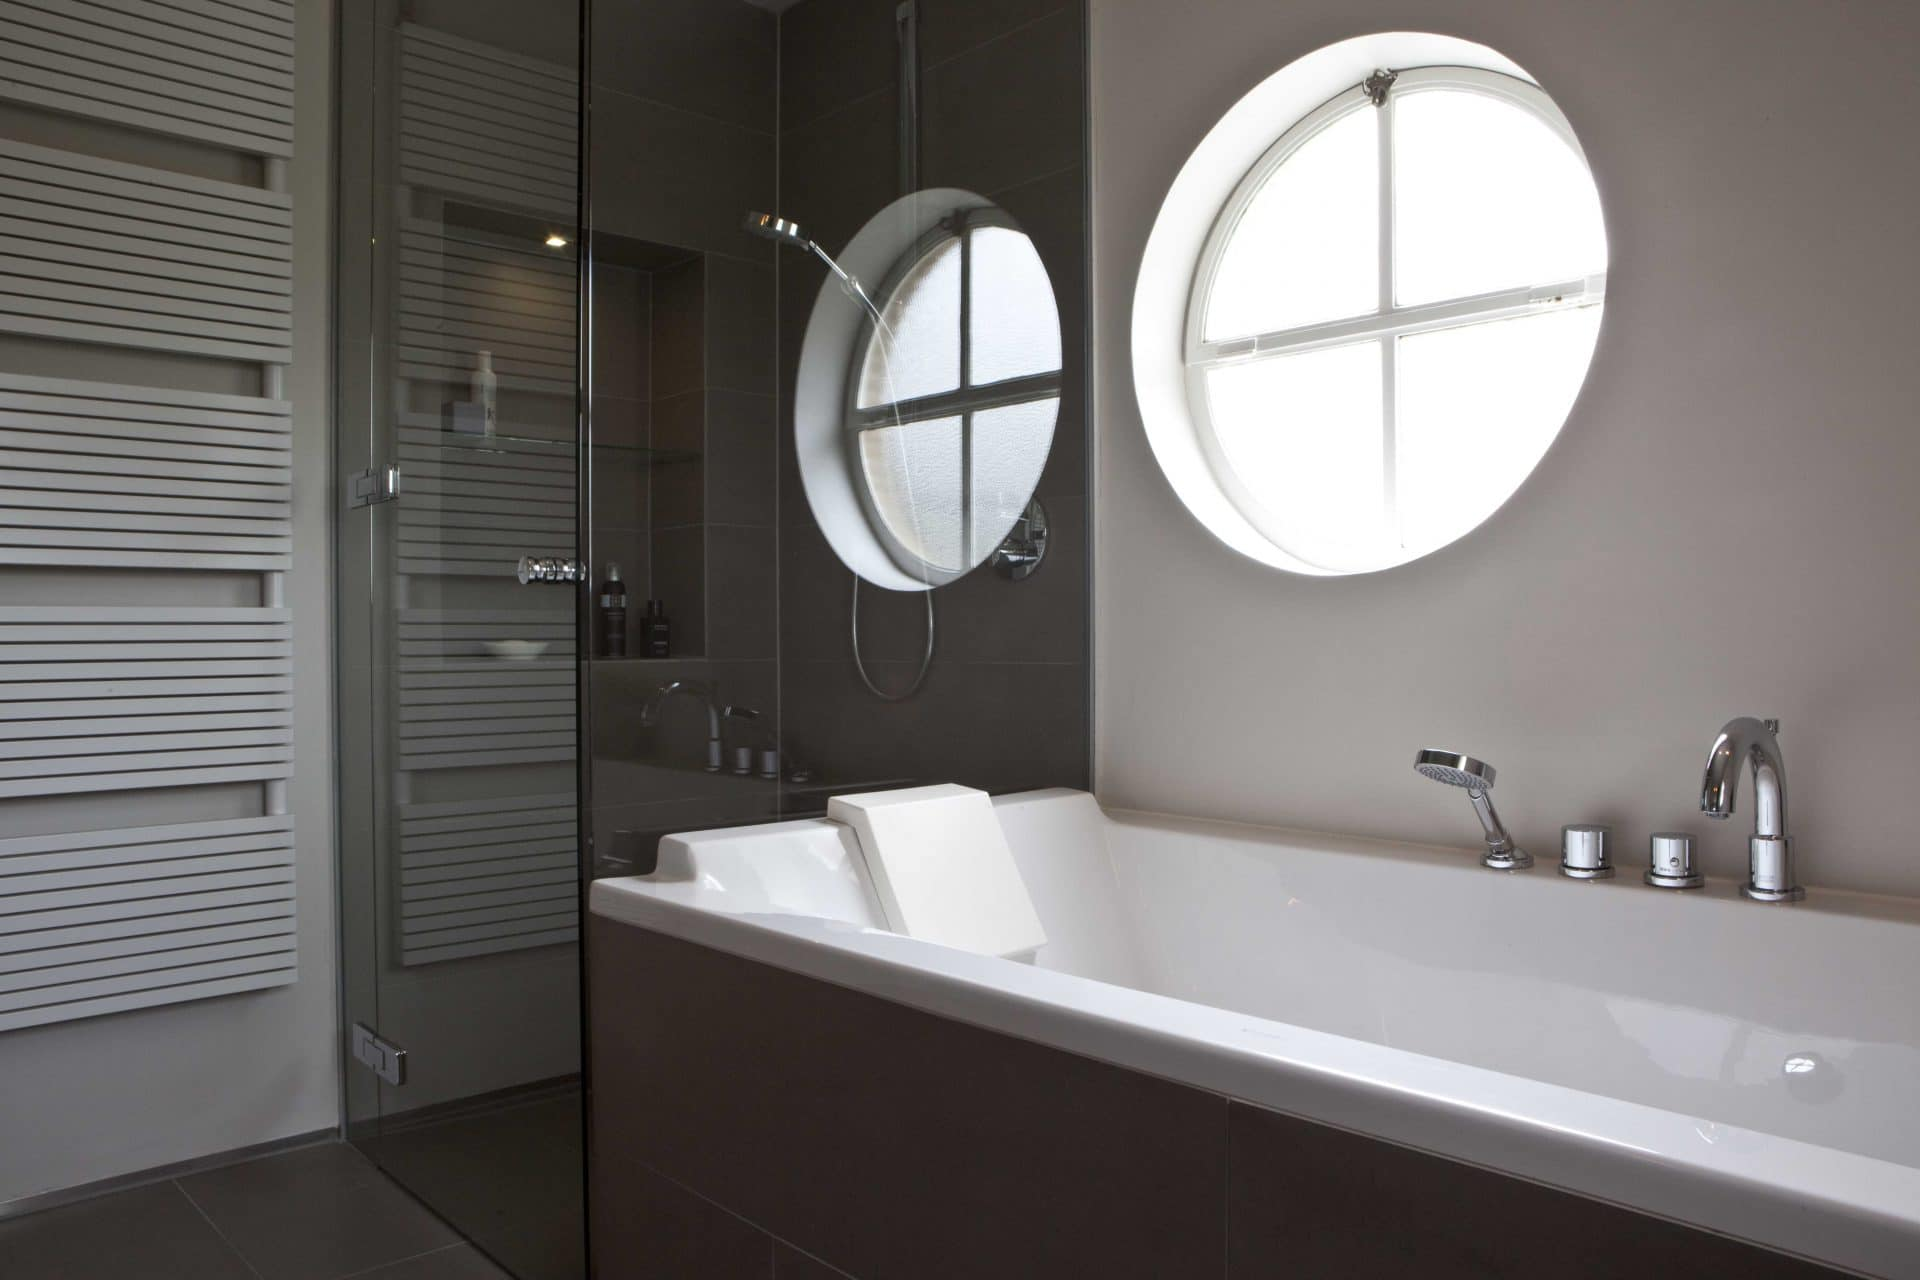 douchewand aan badwand gemonteerd